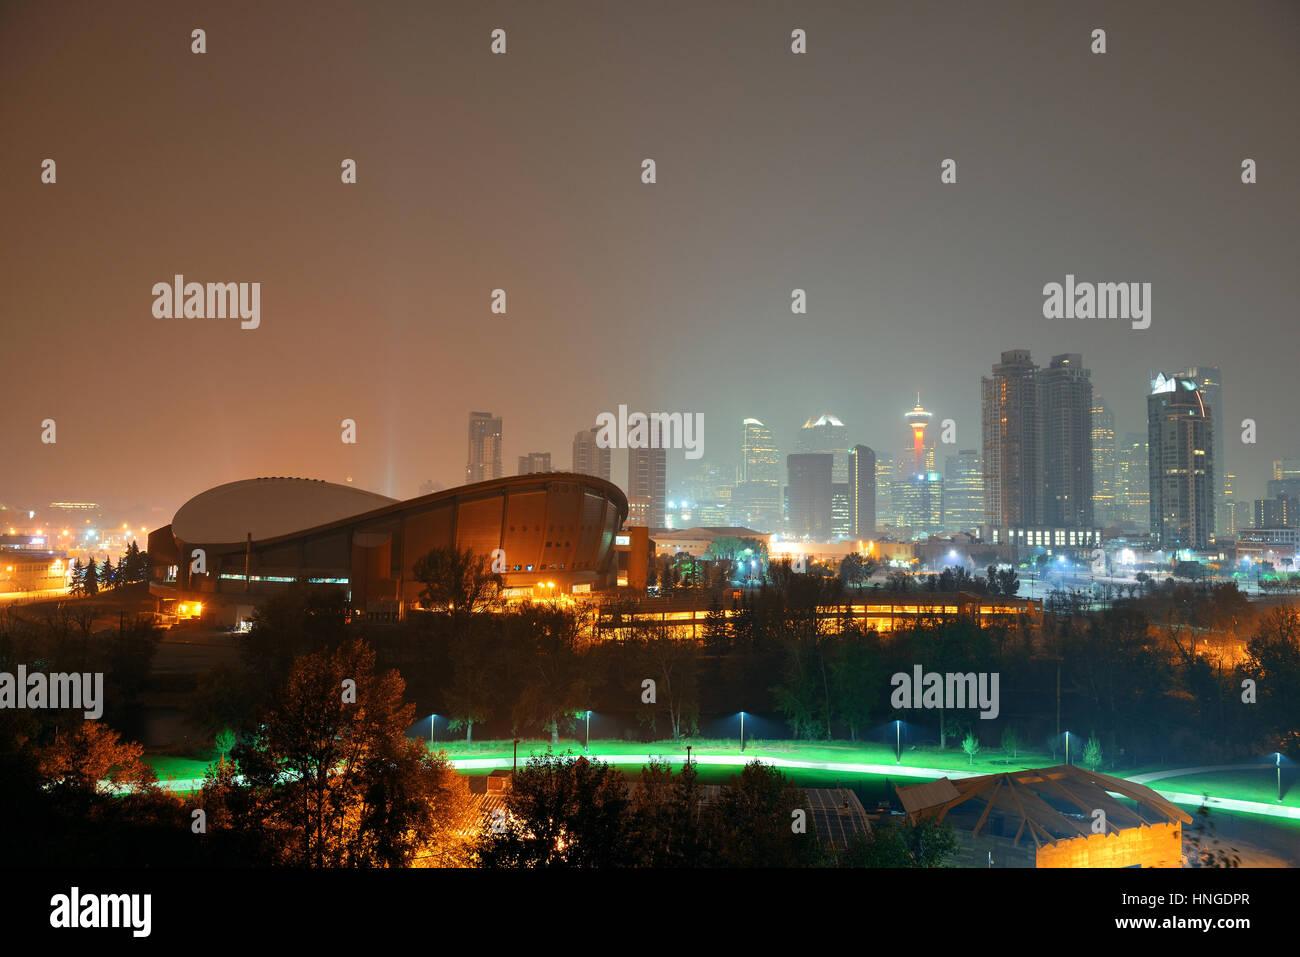 Calgary Stadtbild in Alberta in der Nacht, Kanada. Stockbild